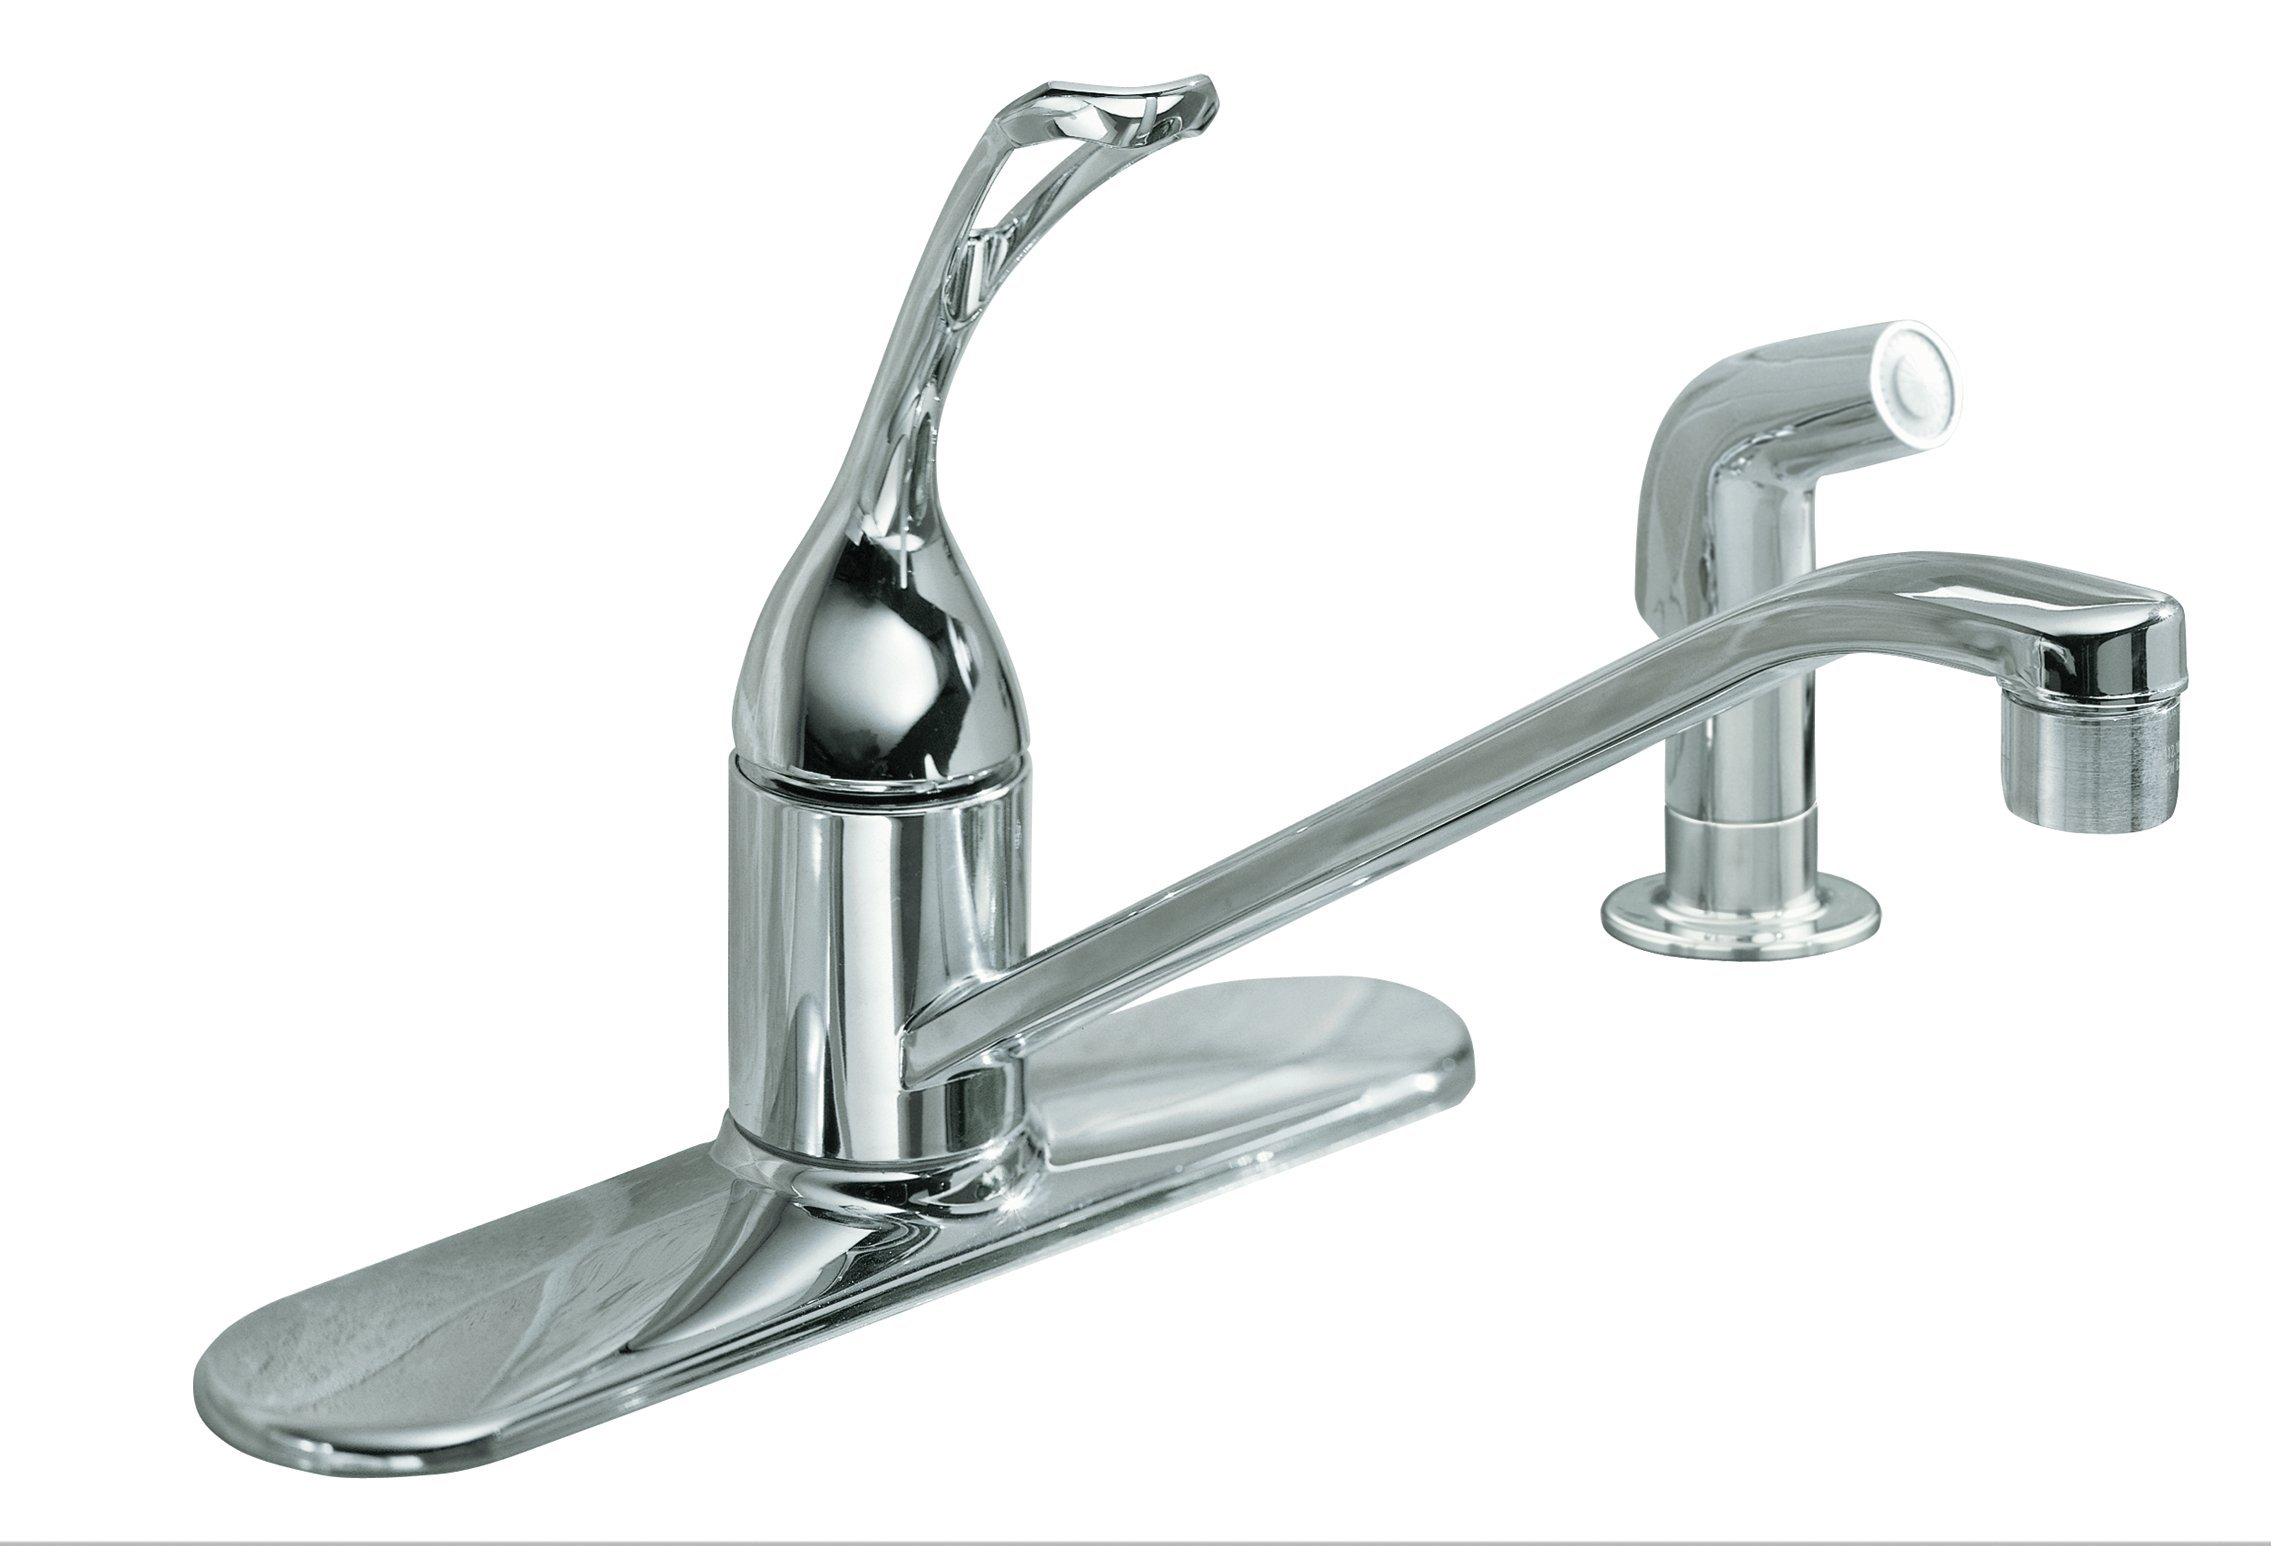 Moen Haysfield Single Handle Pull Down Sprayer Kitchen Faucet Cartridge